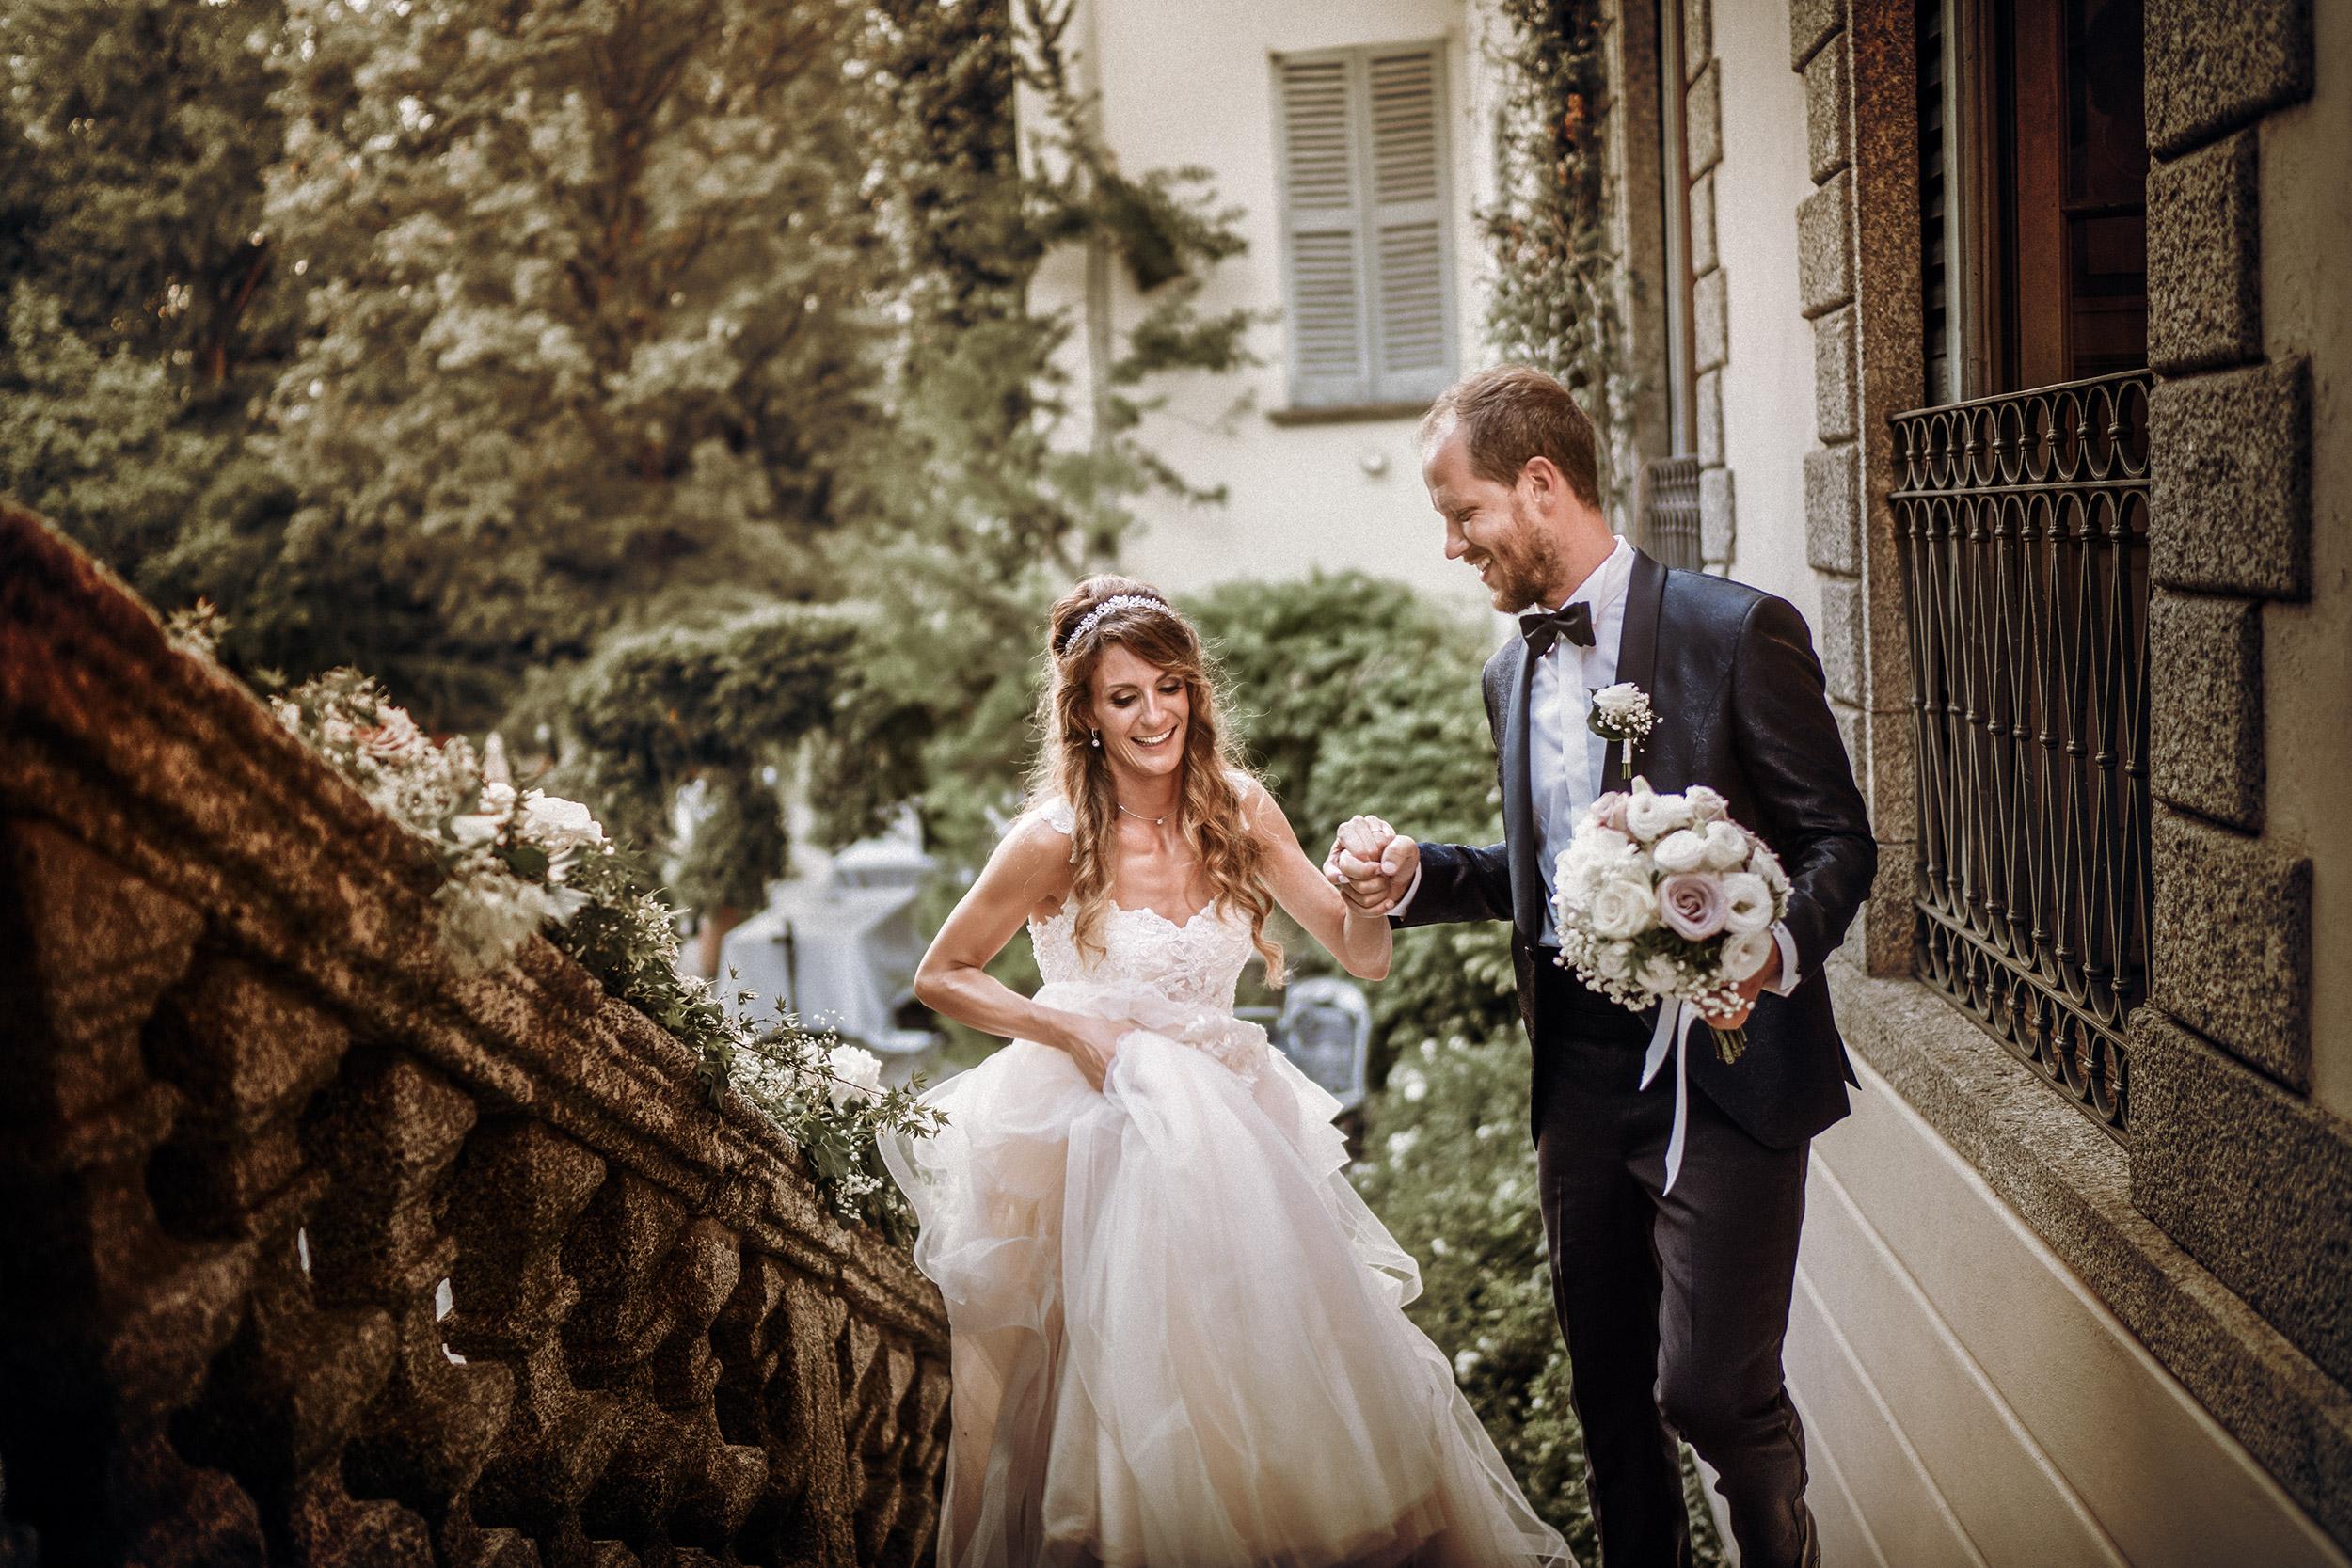 001 fotografo matrimonio villa parravicino sossnovsky erba 2